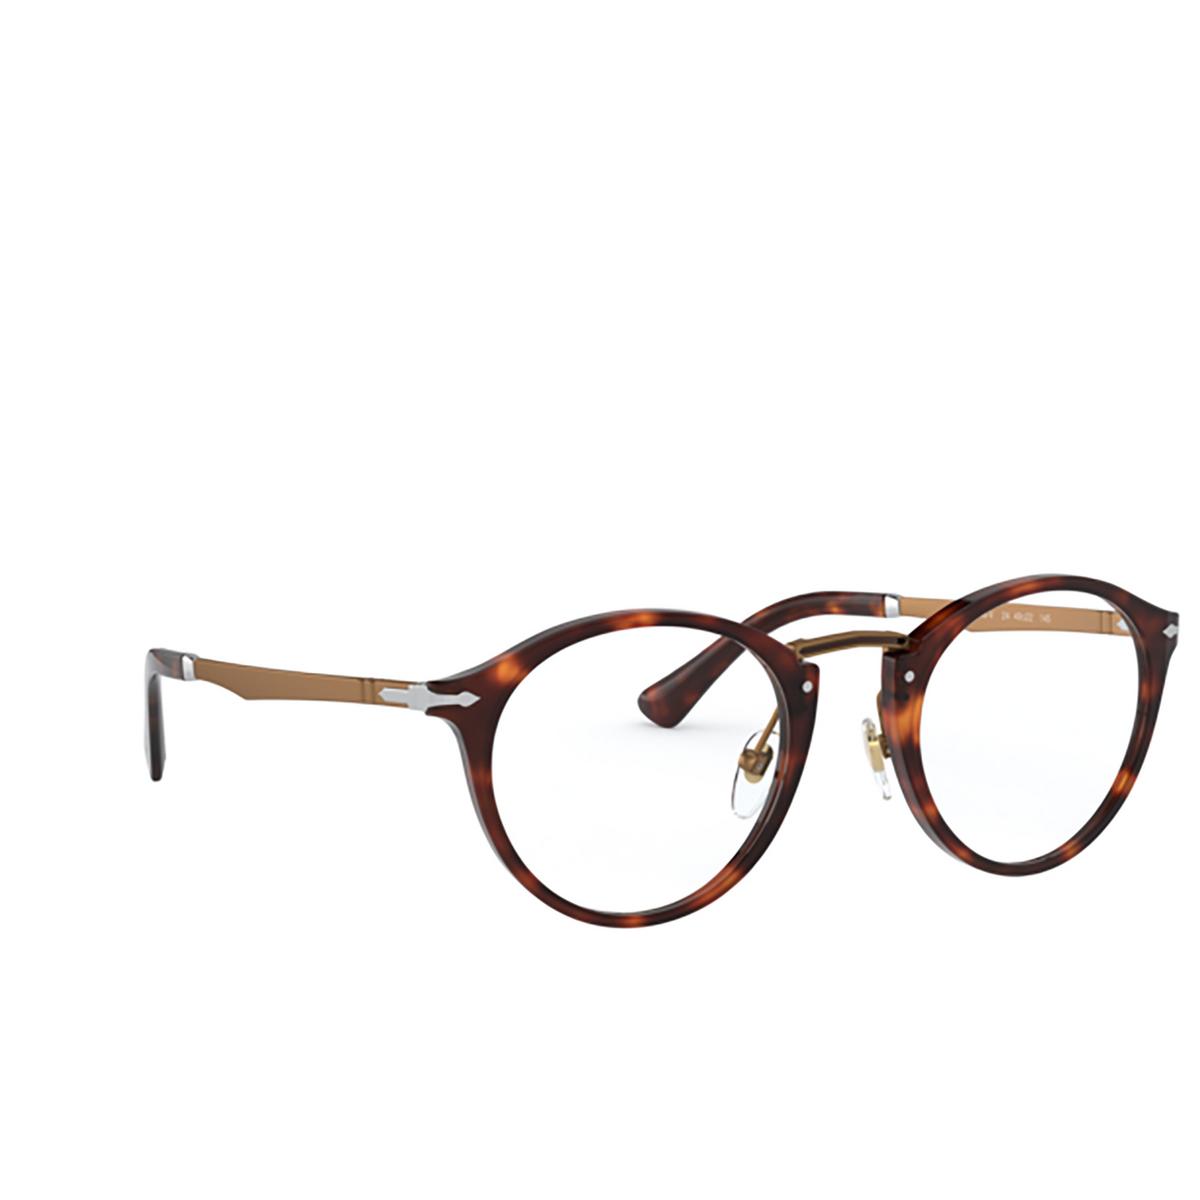 Persol® Round Eyeglasses: PO3248V color Havana 24 - three-quarters view.